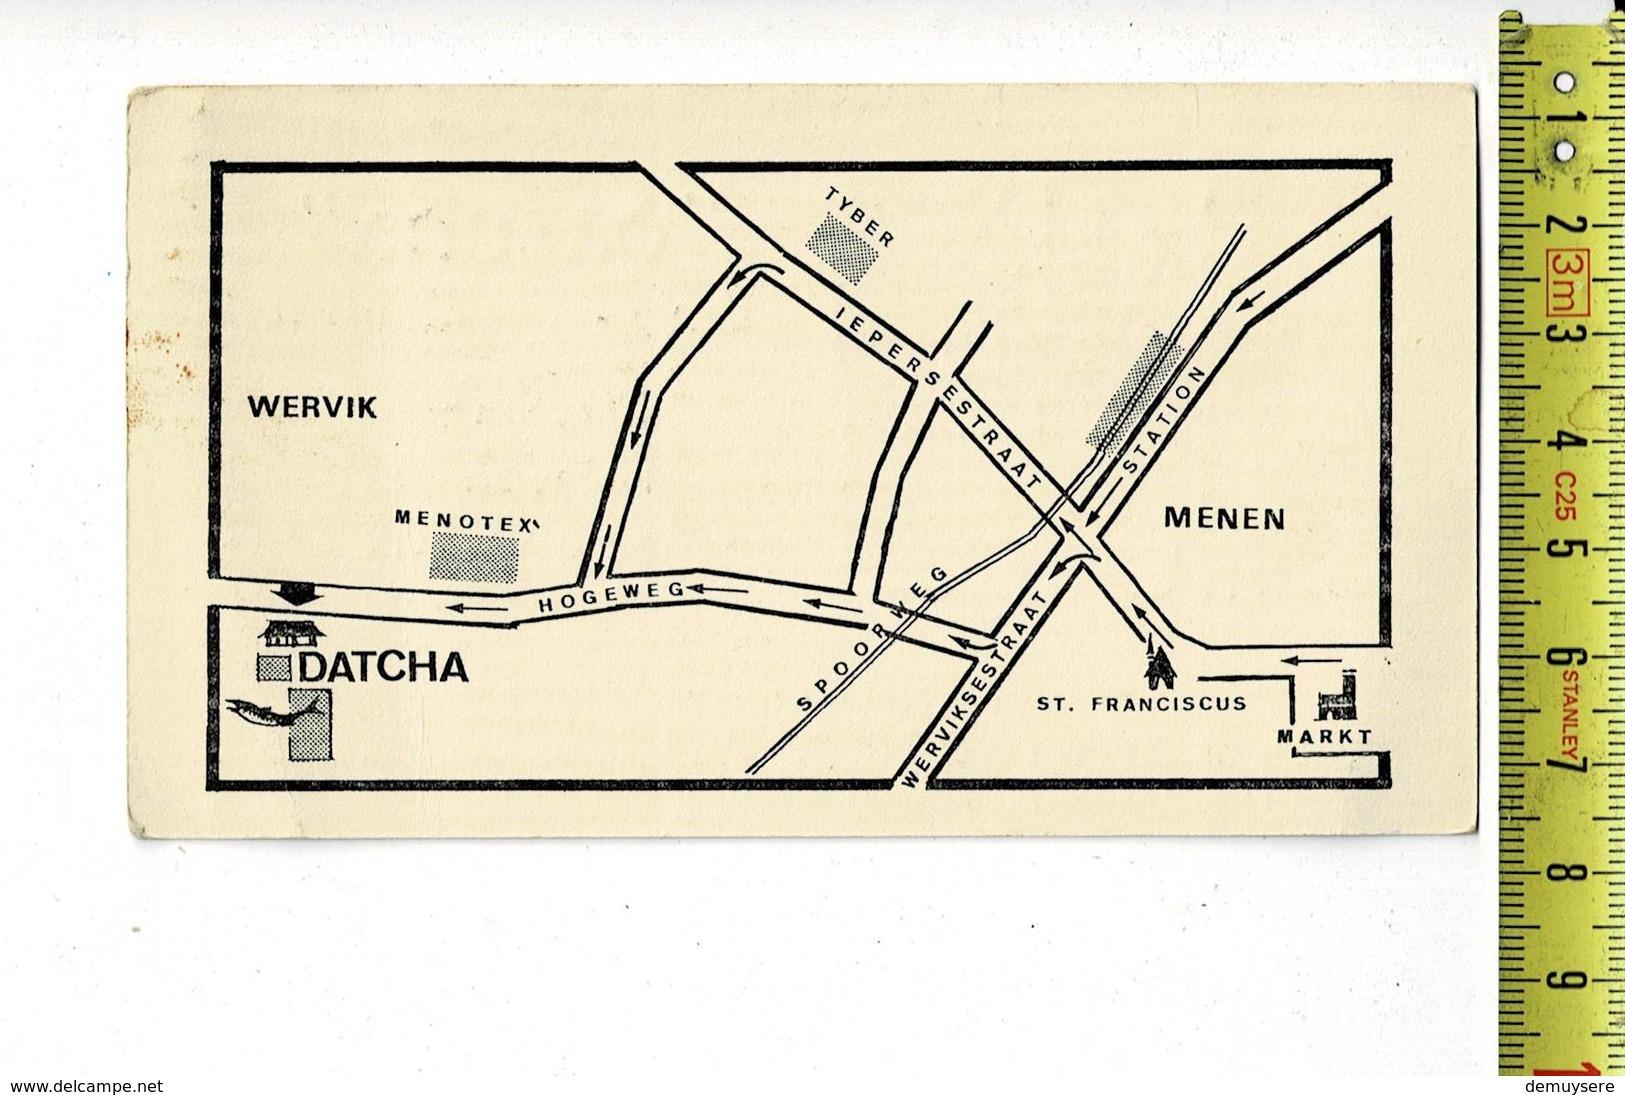 KL 9864 - DATCHA WERVIK - BAR RESTAURANT - Cartoncini Da Visita